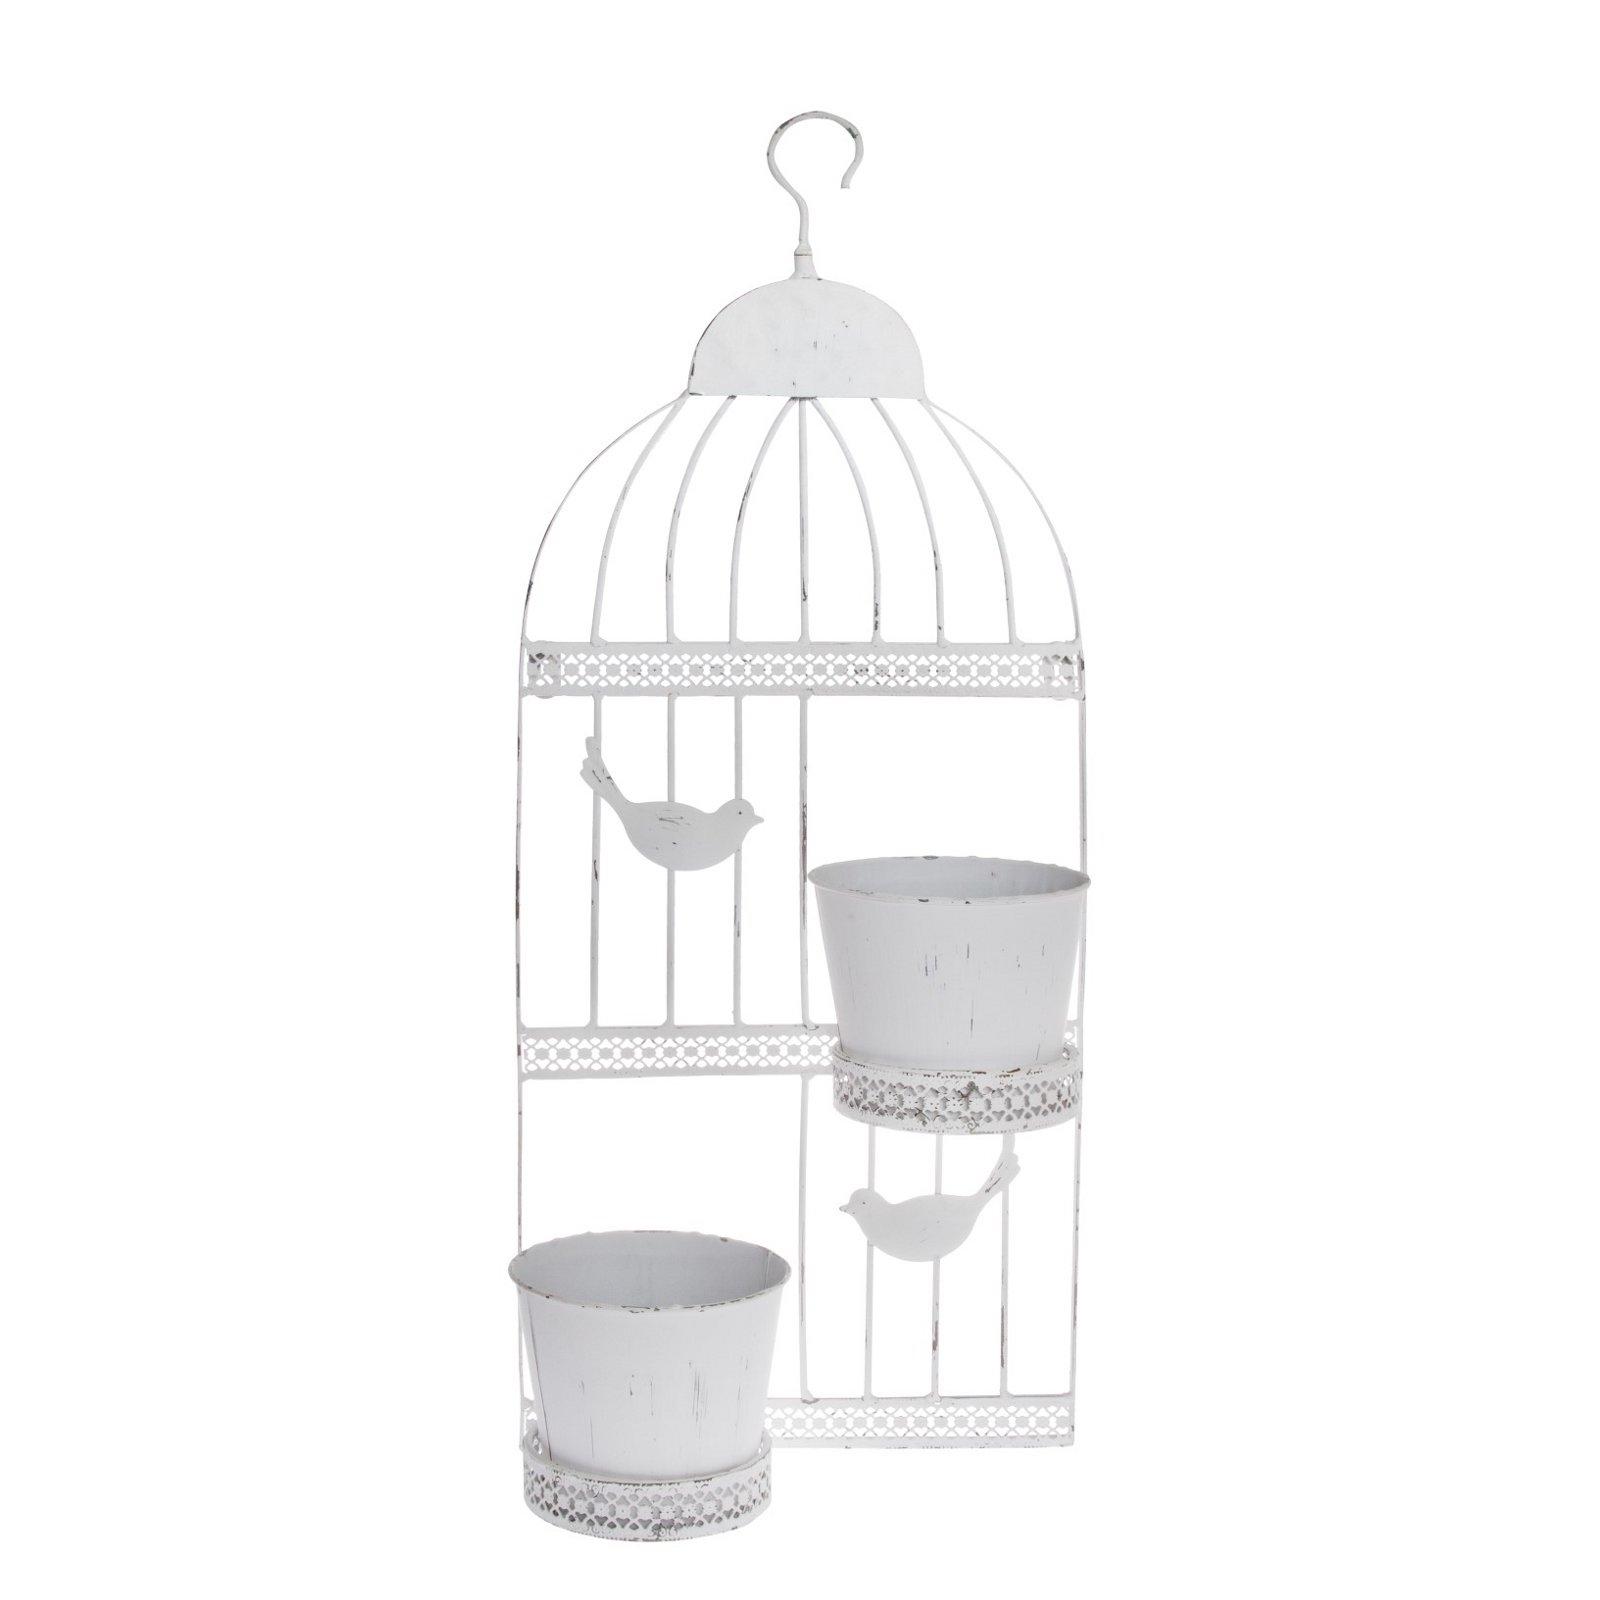 METALL WANDBILD  BIRD    75x28,5x14 cm, cm, cm, weiß, Shabby Style   Wanddekoration ed58c0